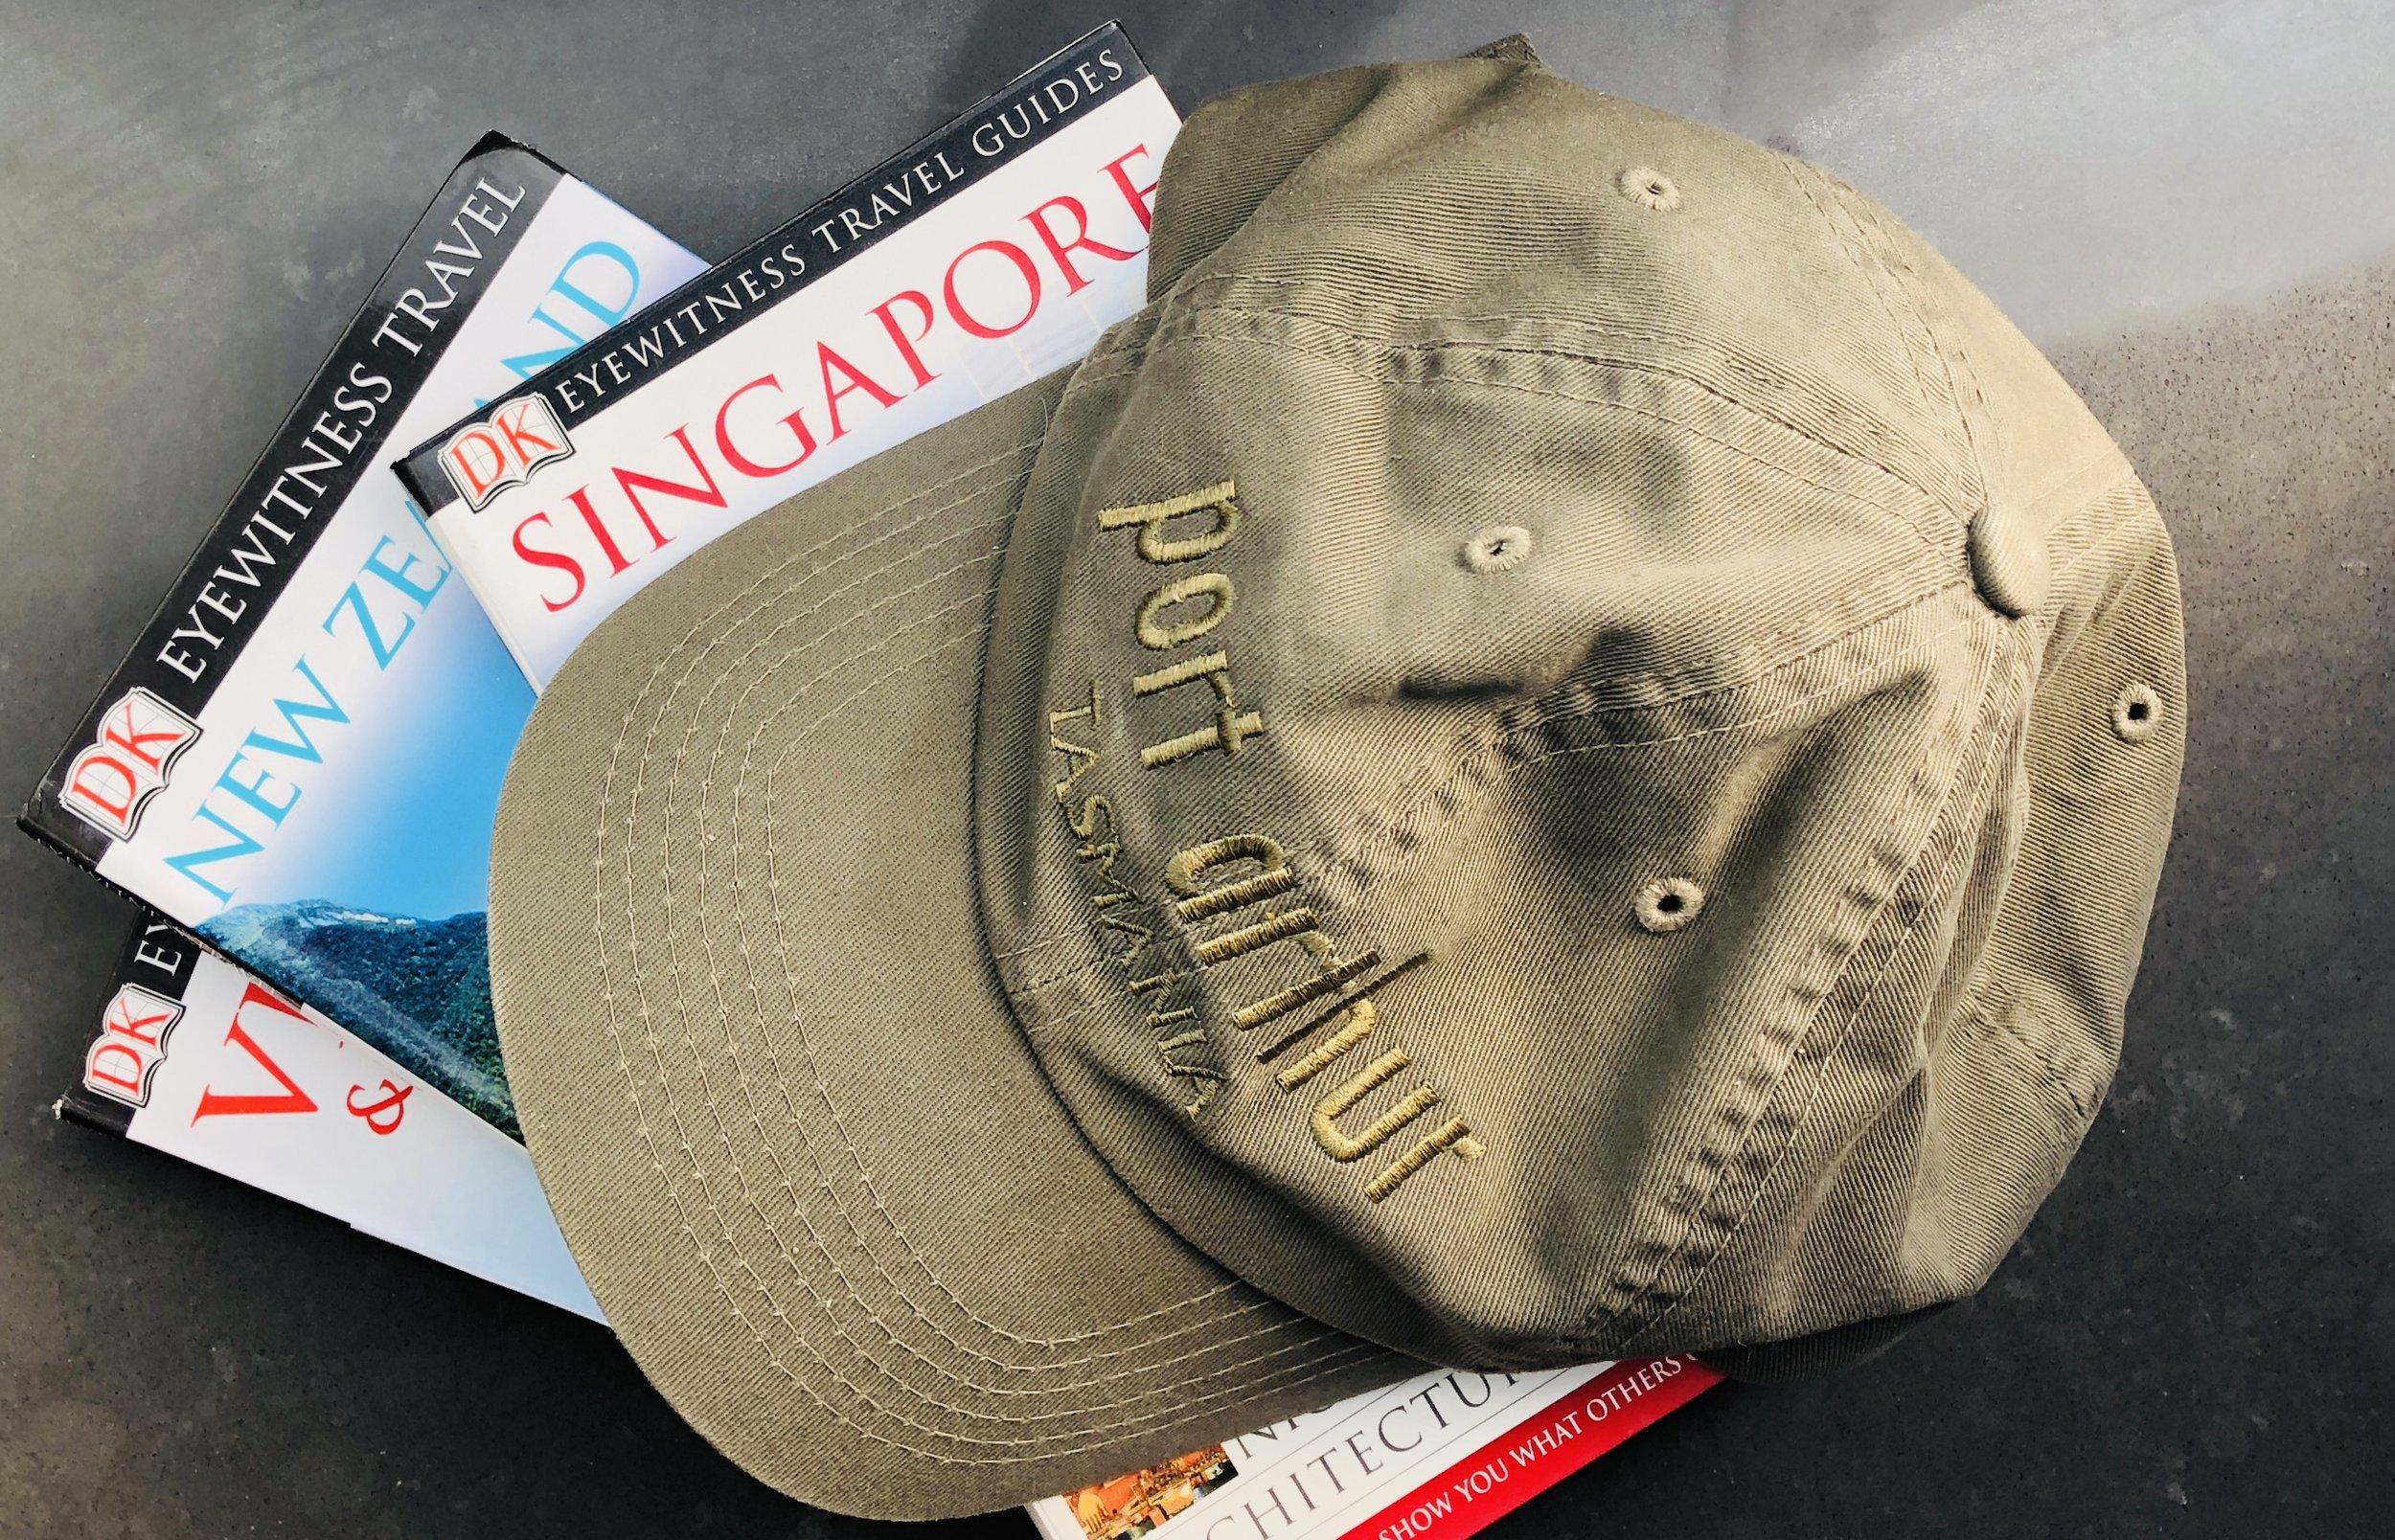 Peak caps: the ubiquitous tourist badge. Photo by Slobodanka Graham